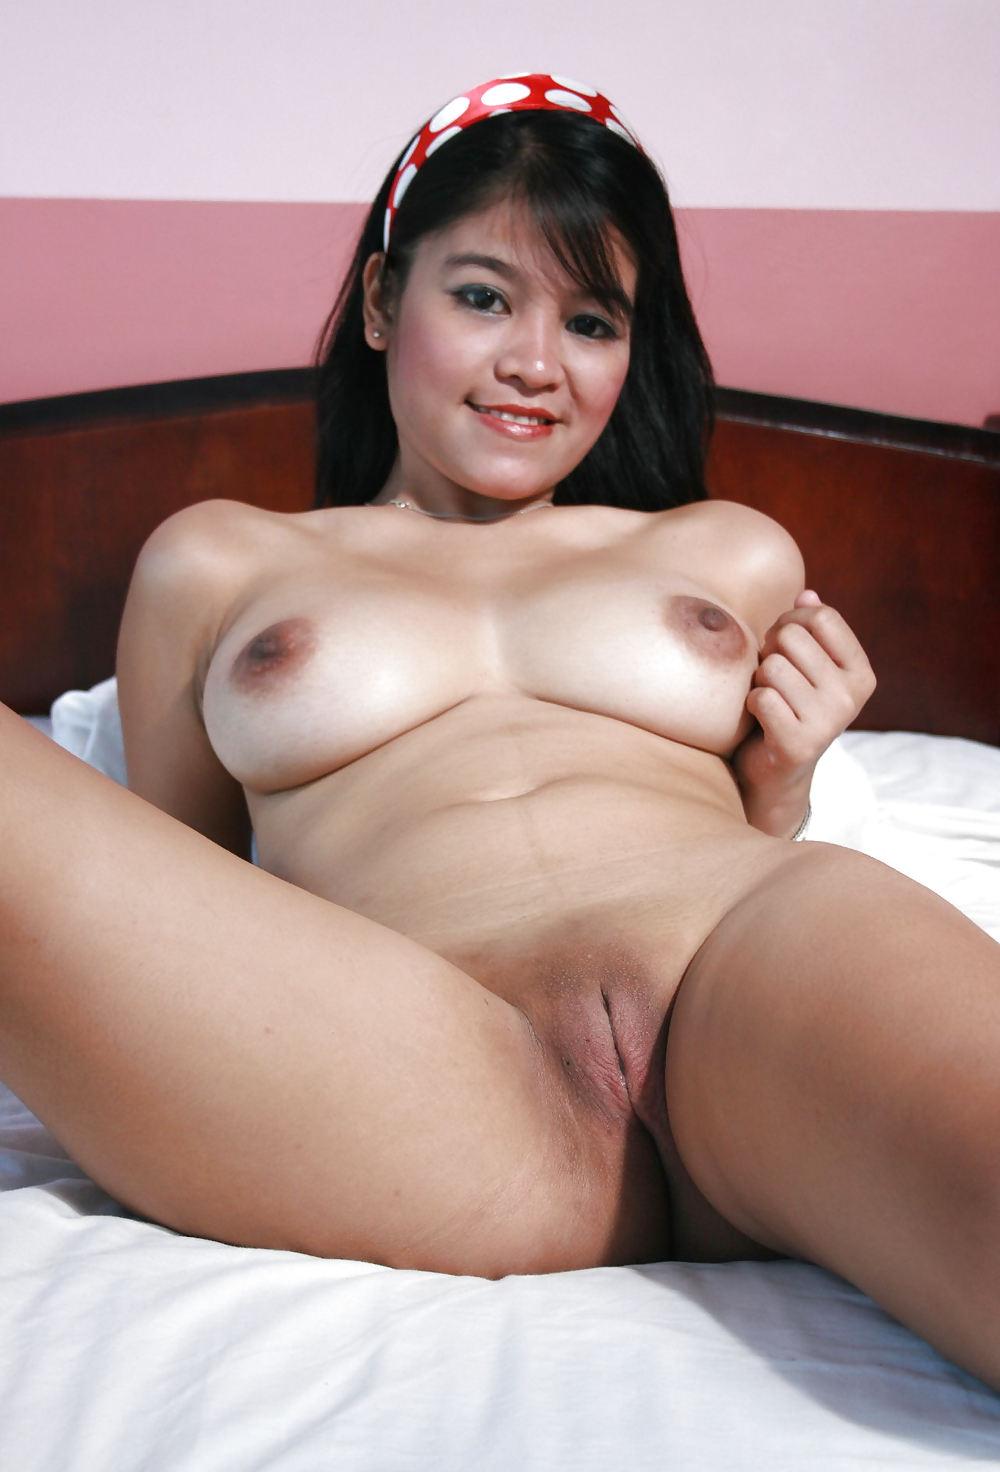 Pinay model porn photos #2